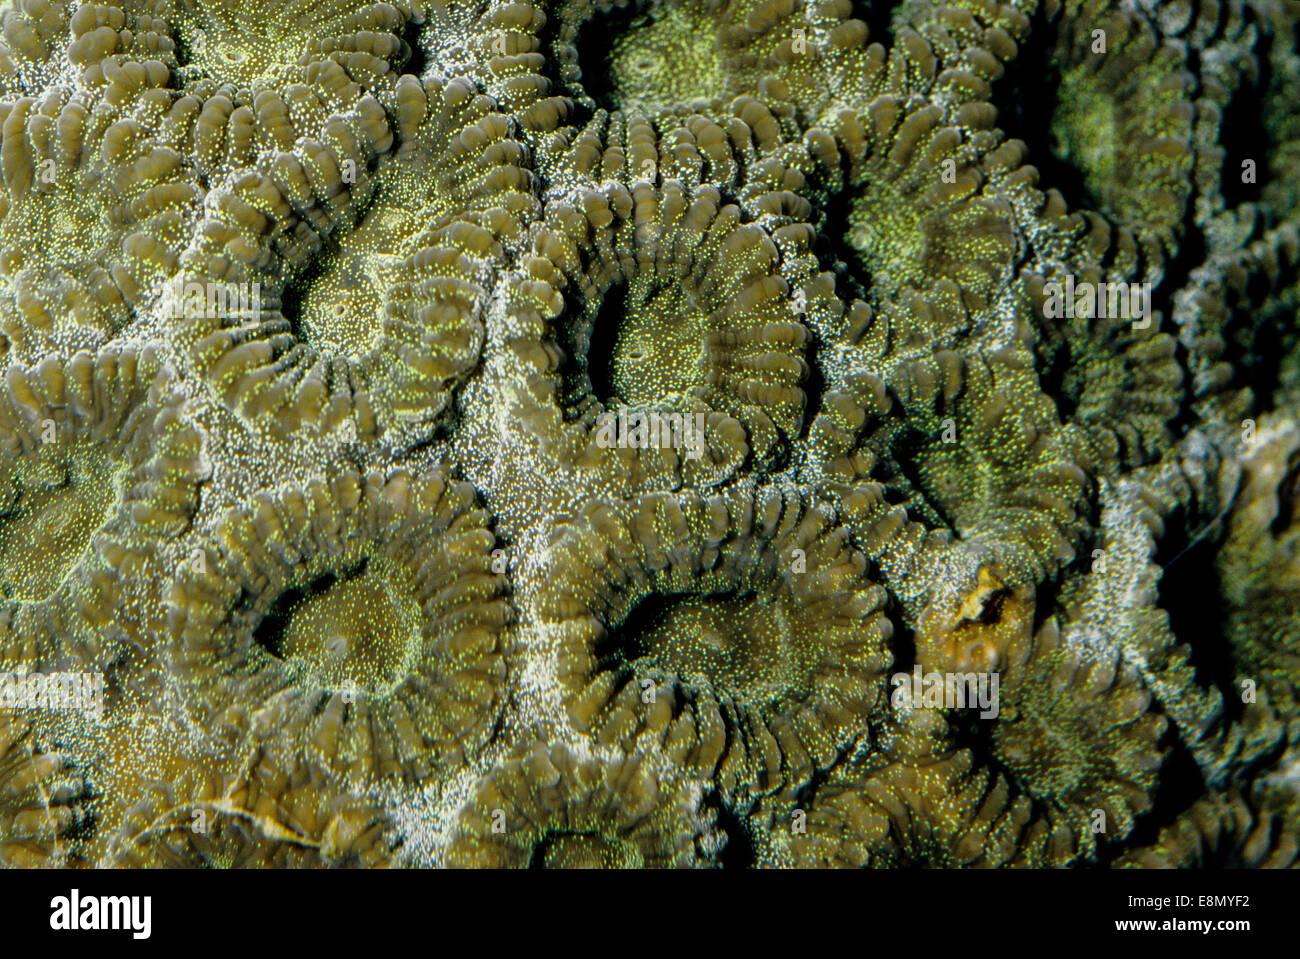 Favia sp., Faviidae Scleractianiae, Indo-pacific Ocean - Stock Image